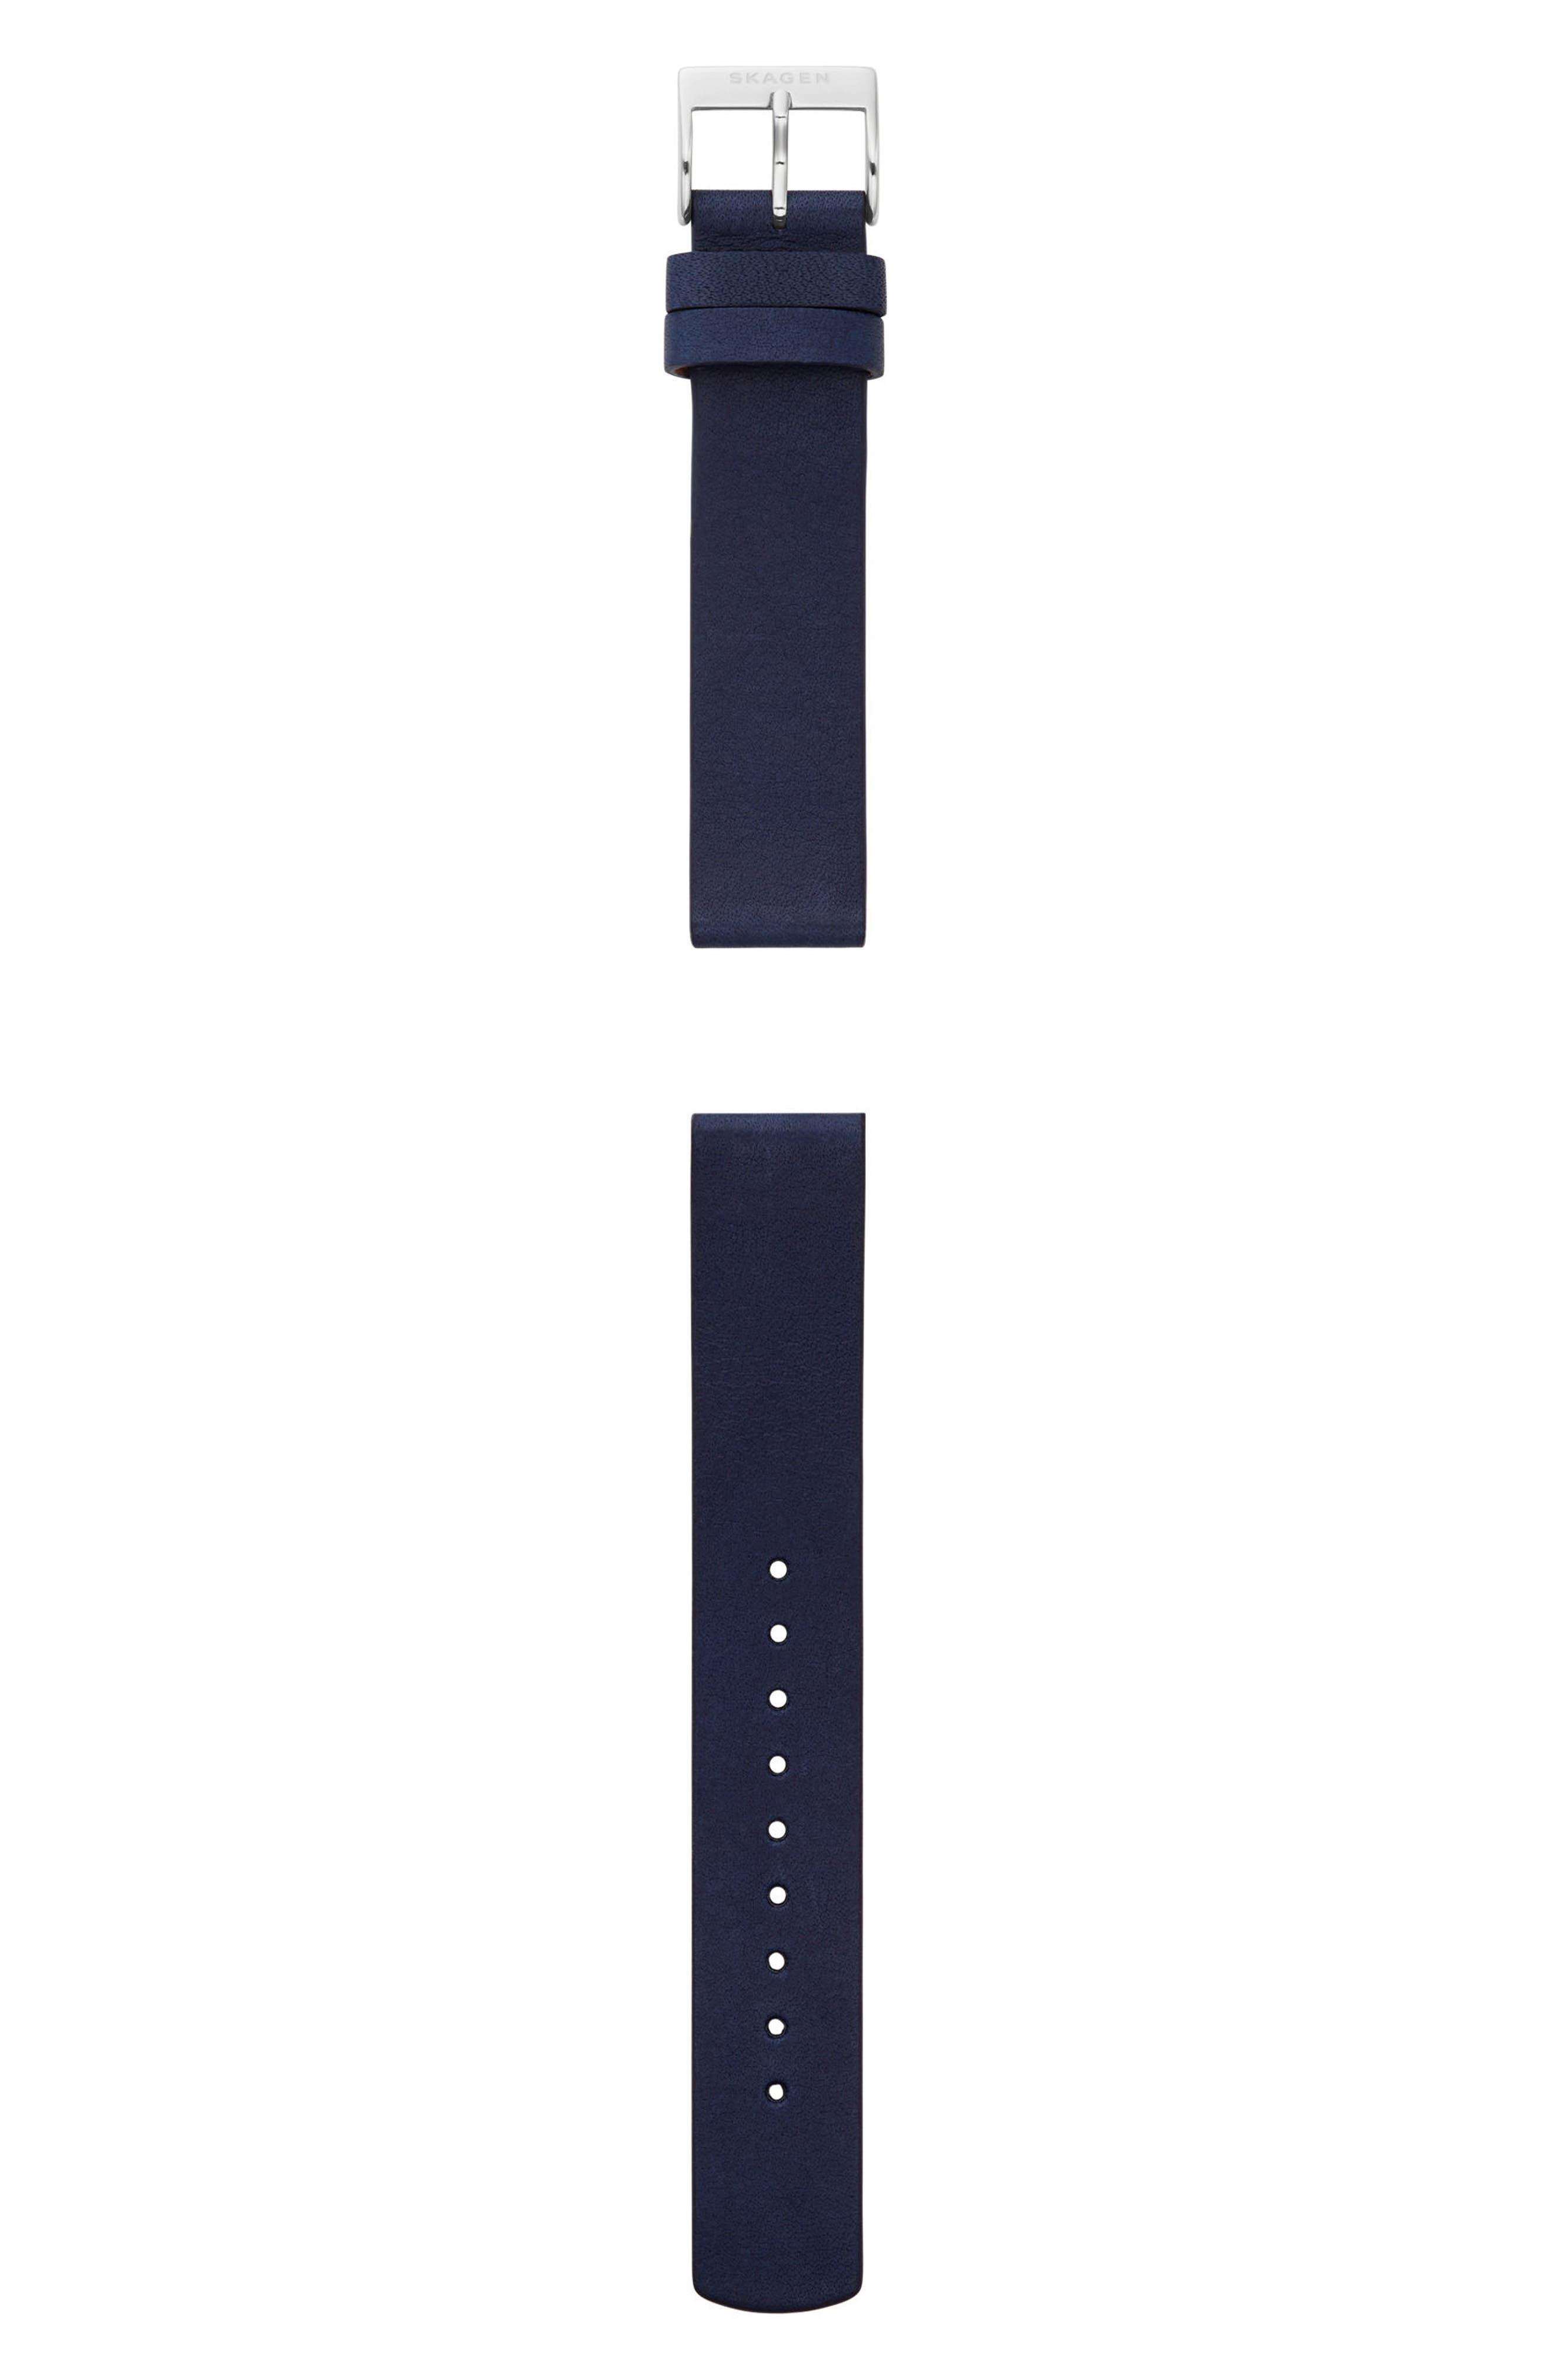 Main Image - Skagen Leather Watch Strap, 16mm